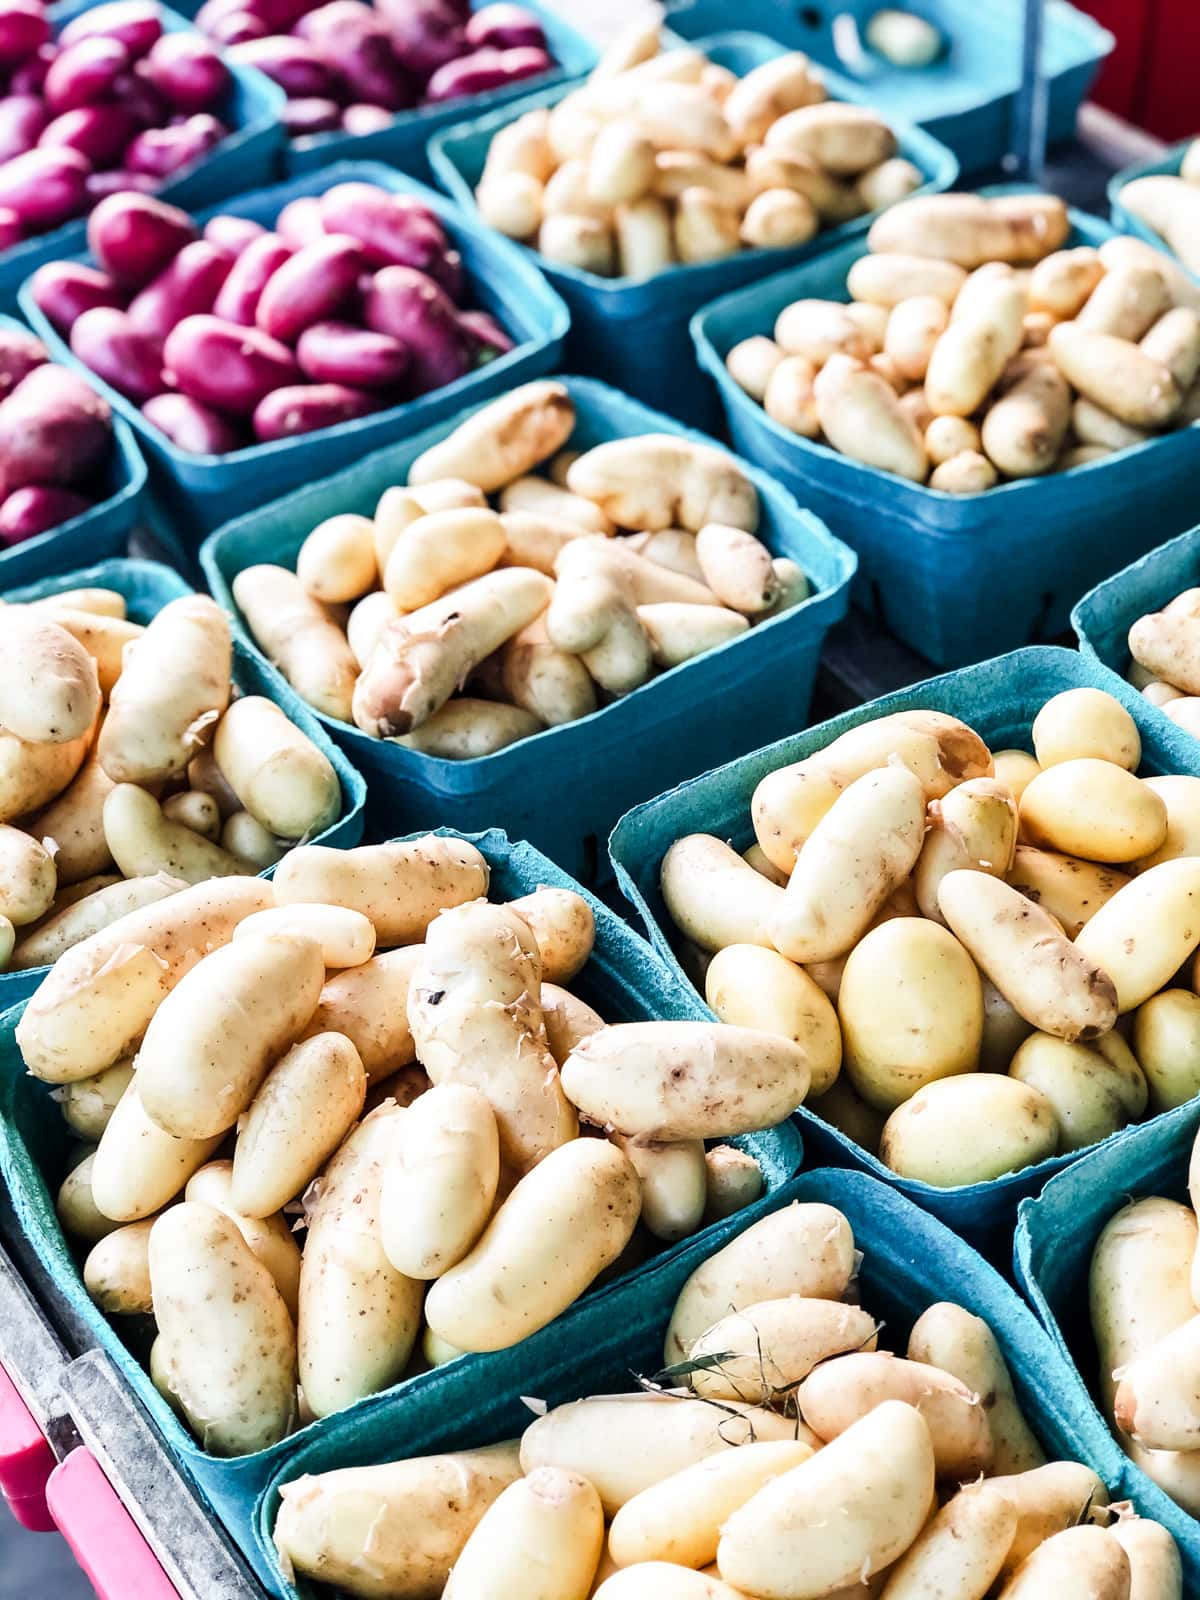 Baskets of freshly dug purple and white potatoes